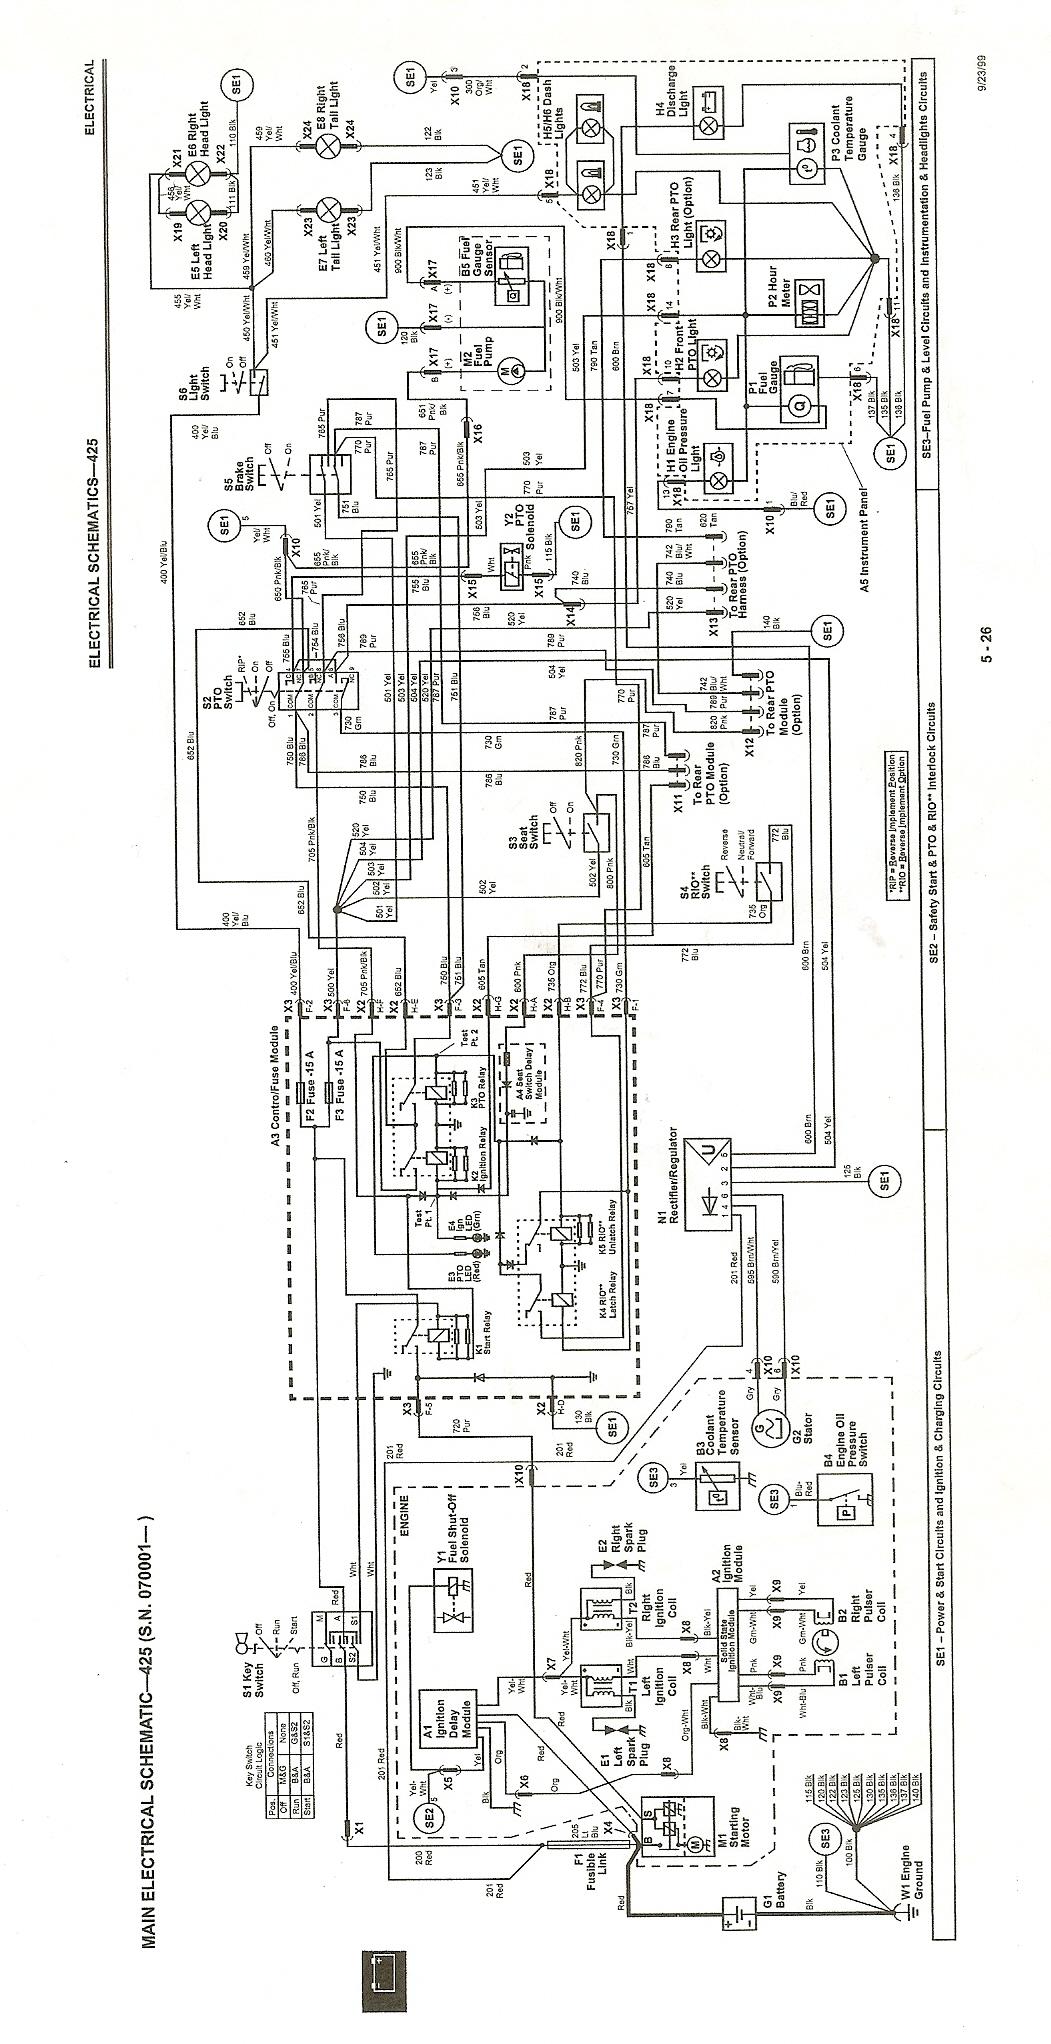 John Deere 425 Wiring Diagram Database